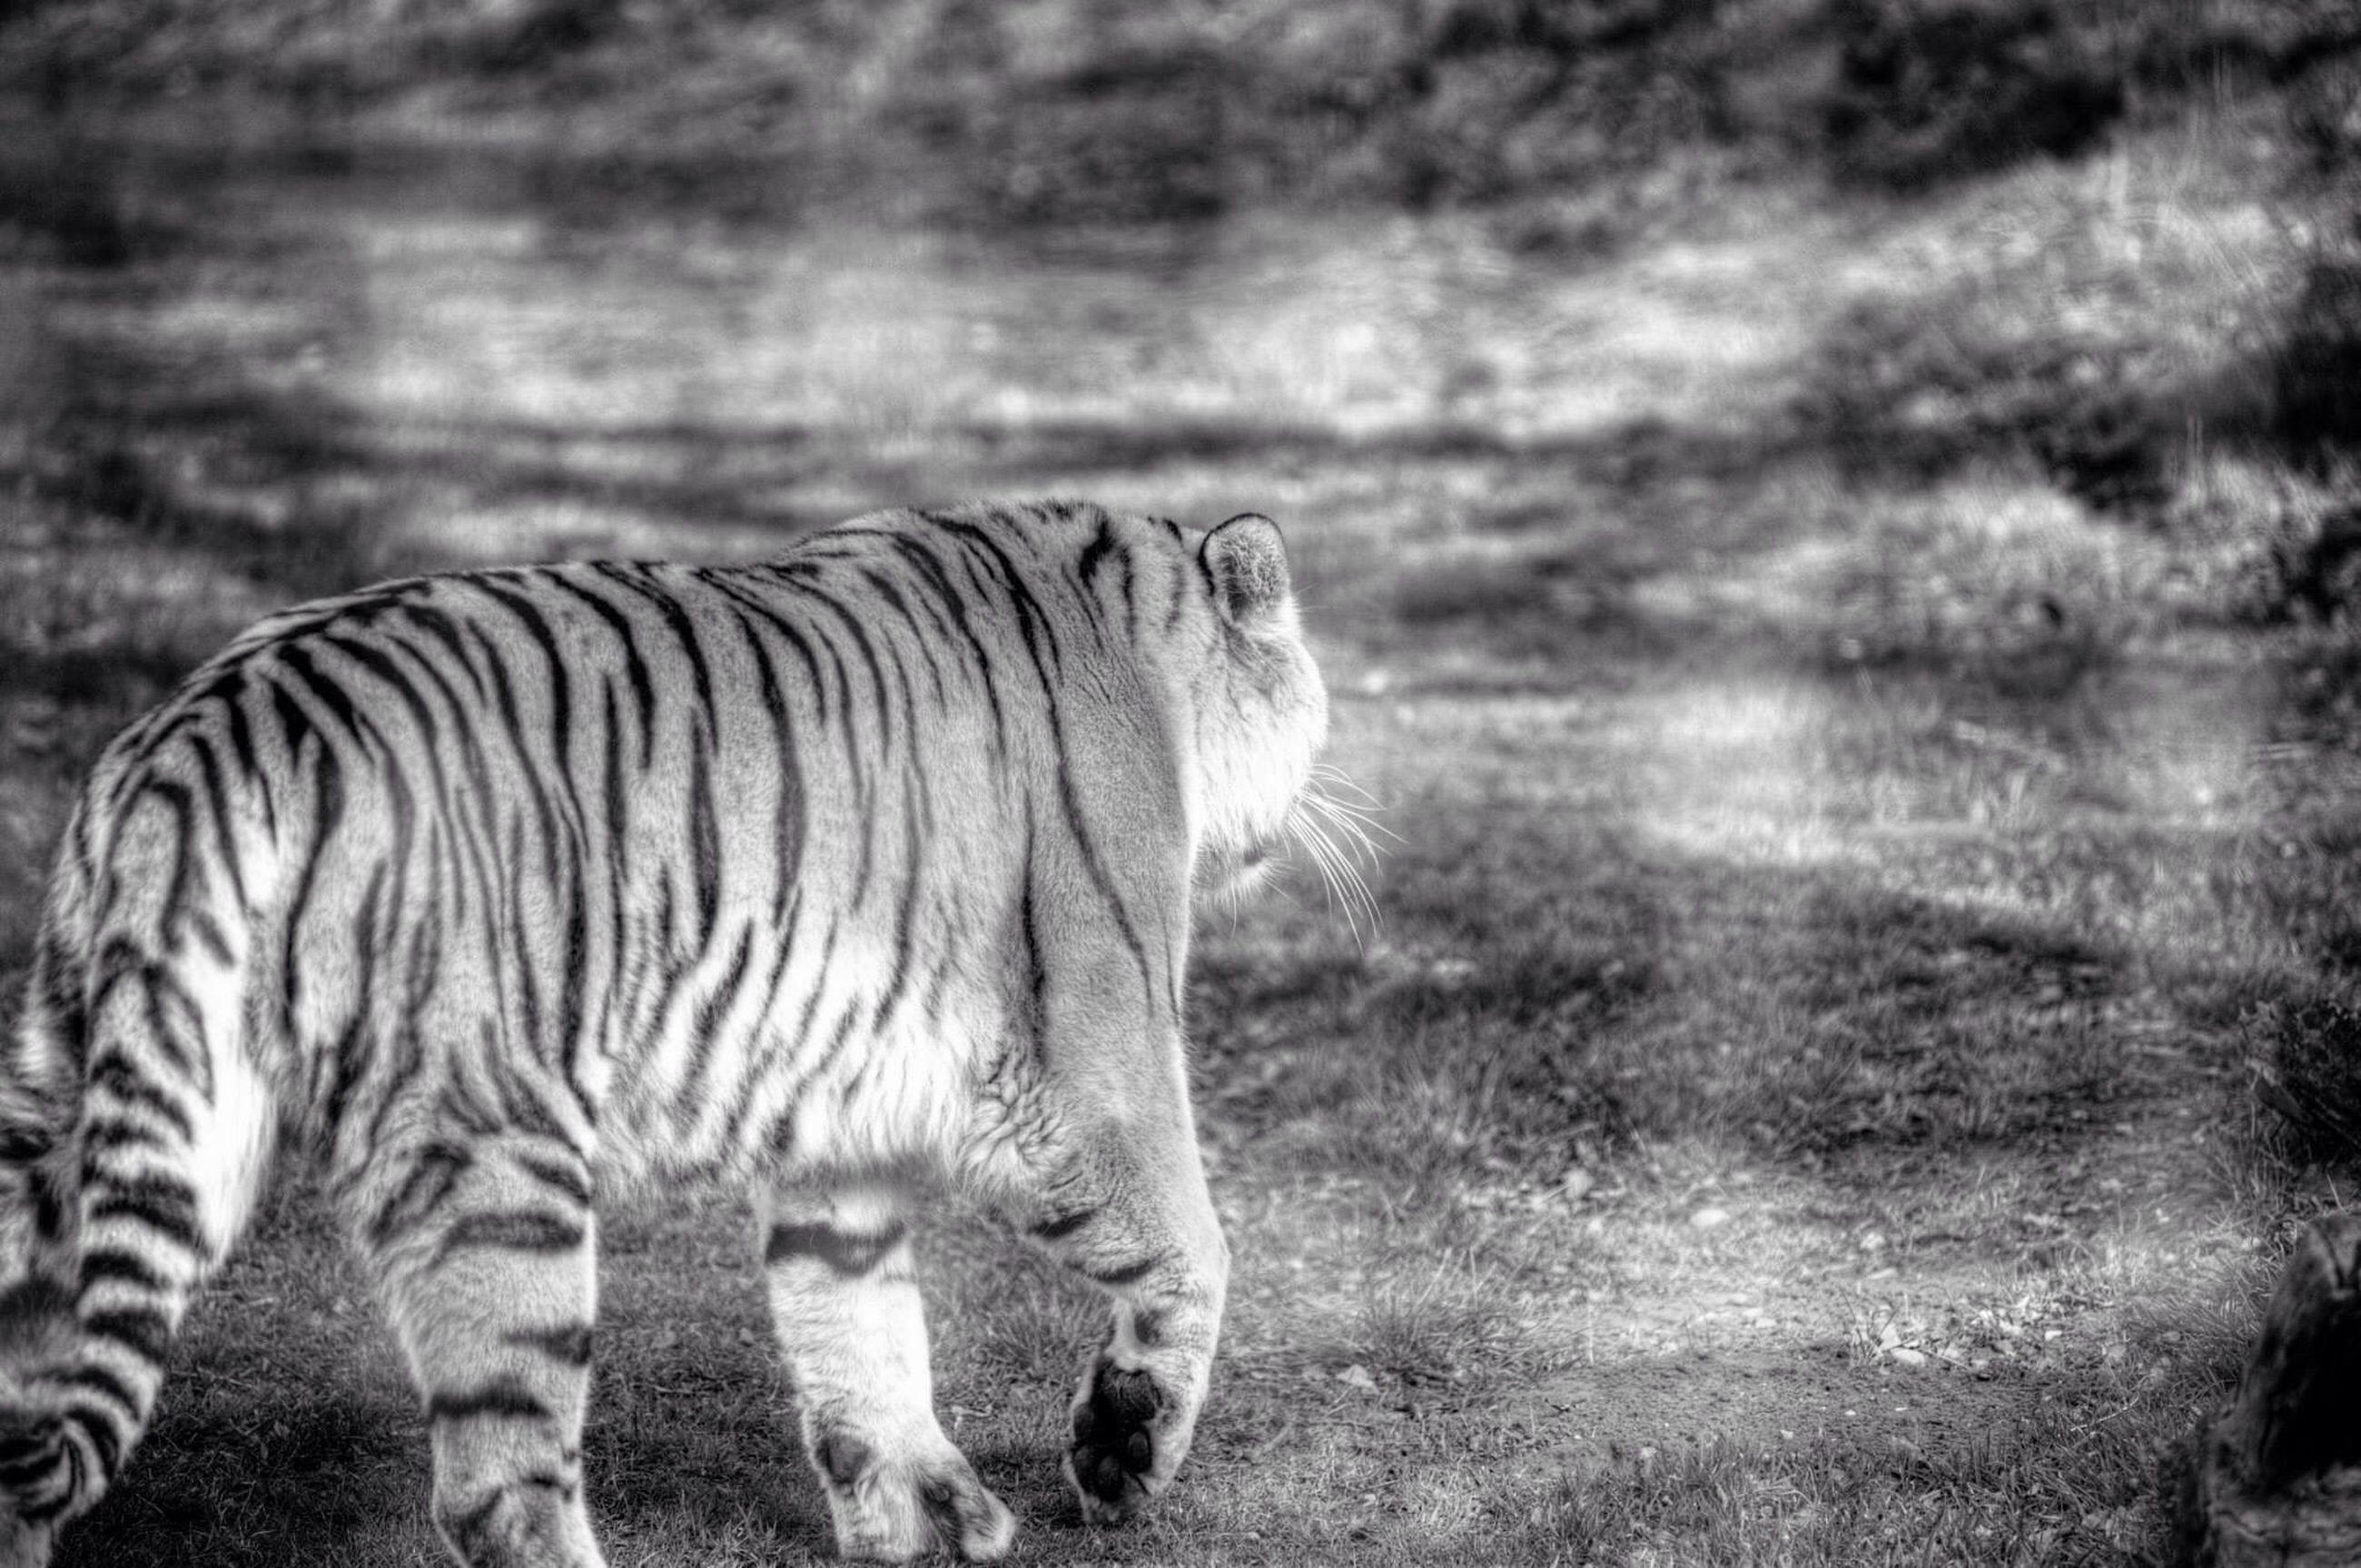 animal themes, mammal, one animal, field, horse, domestic animals, standing, herbivorous, safari animals, focus on foreground, grass, side view, zebra, animal head, livestock, nature, sky, outdoors, grassy, day